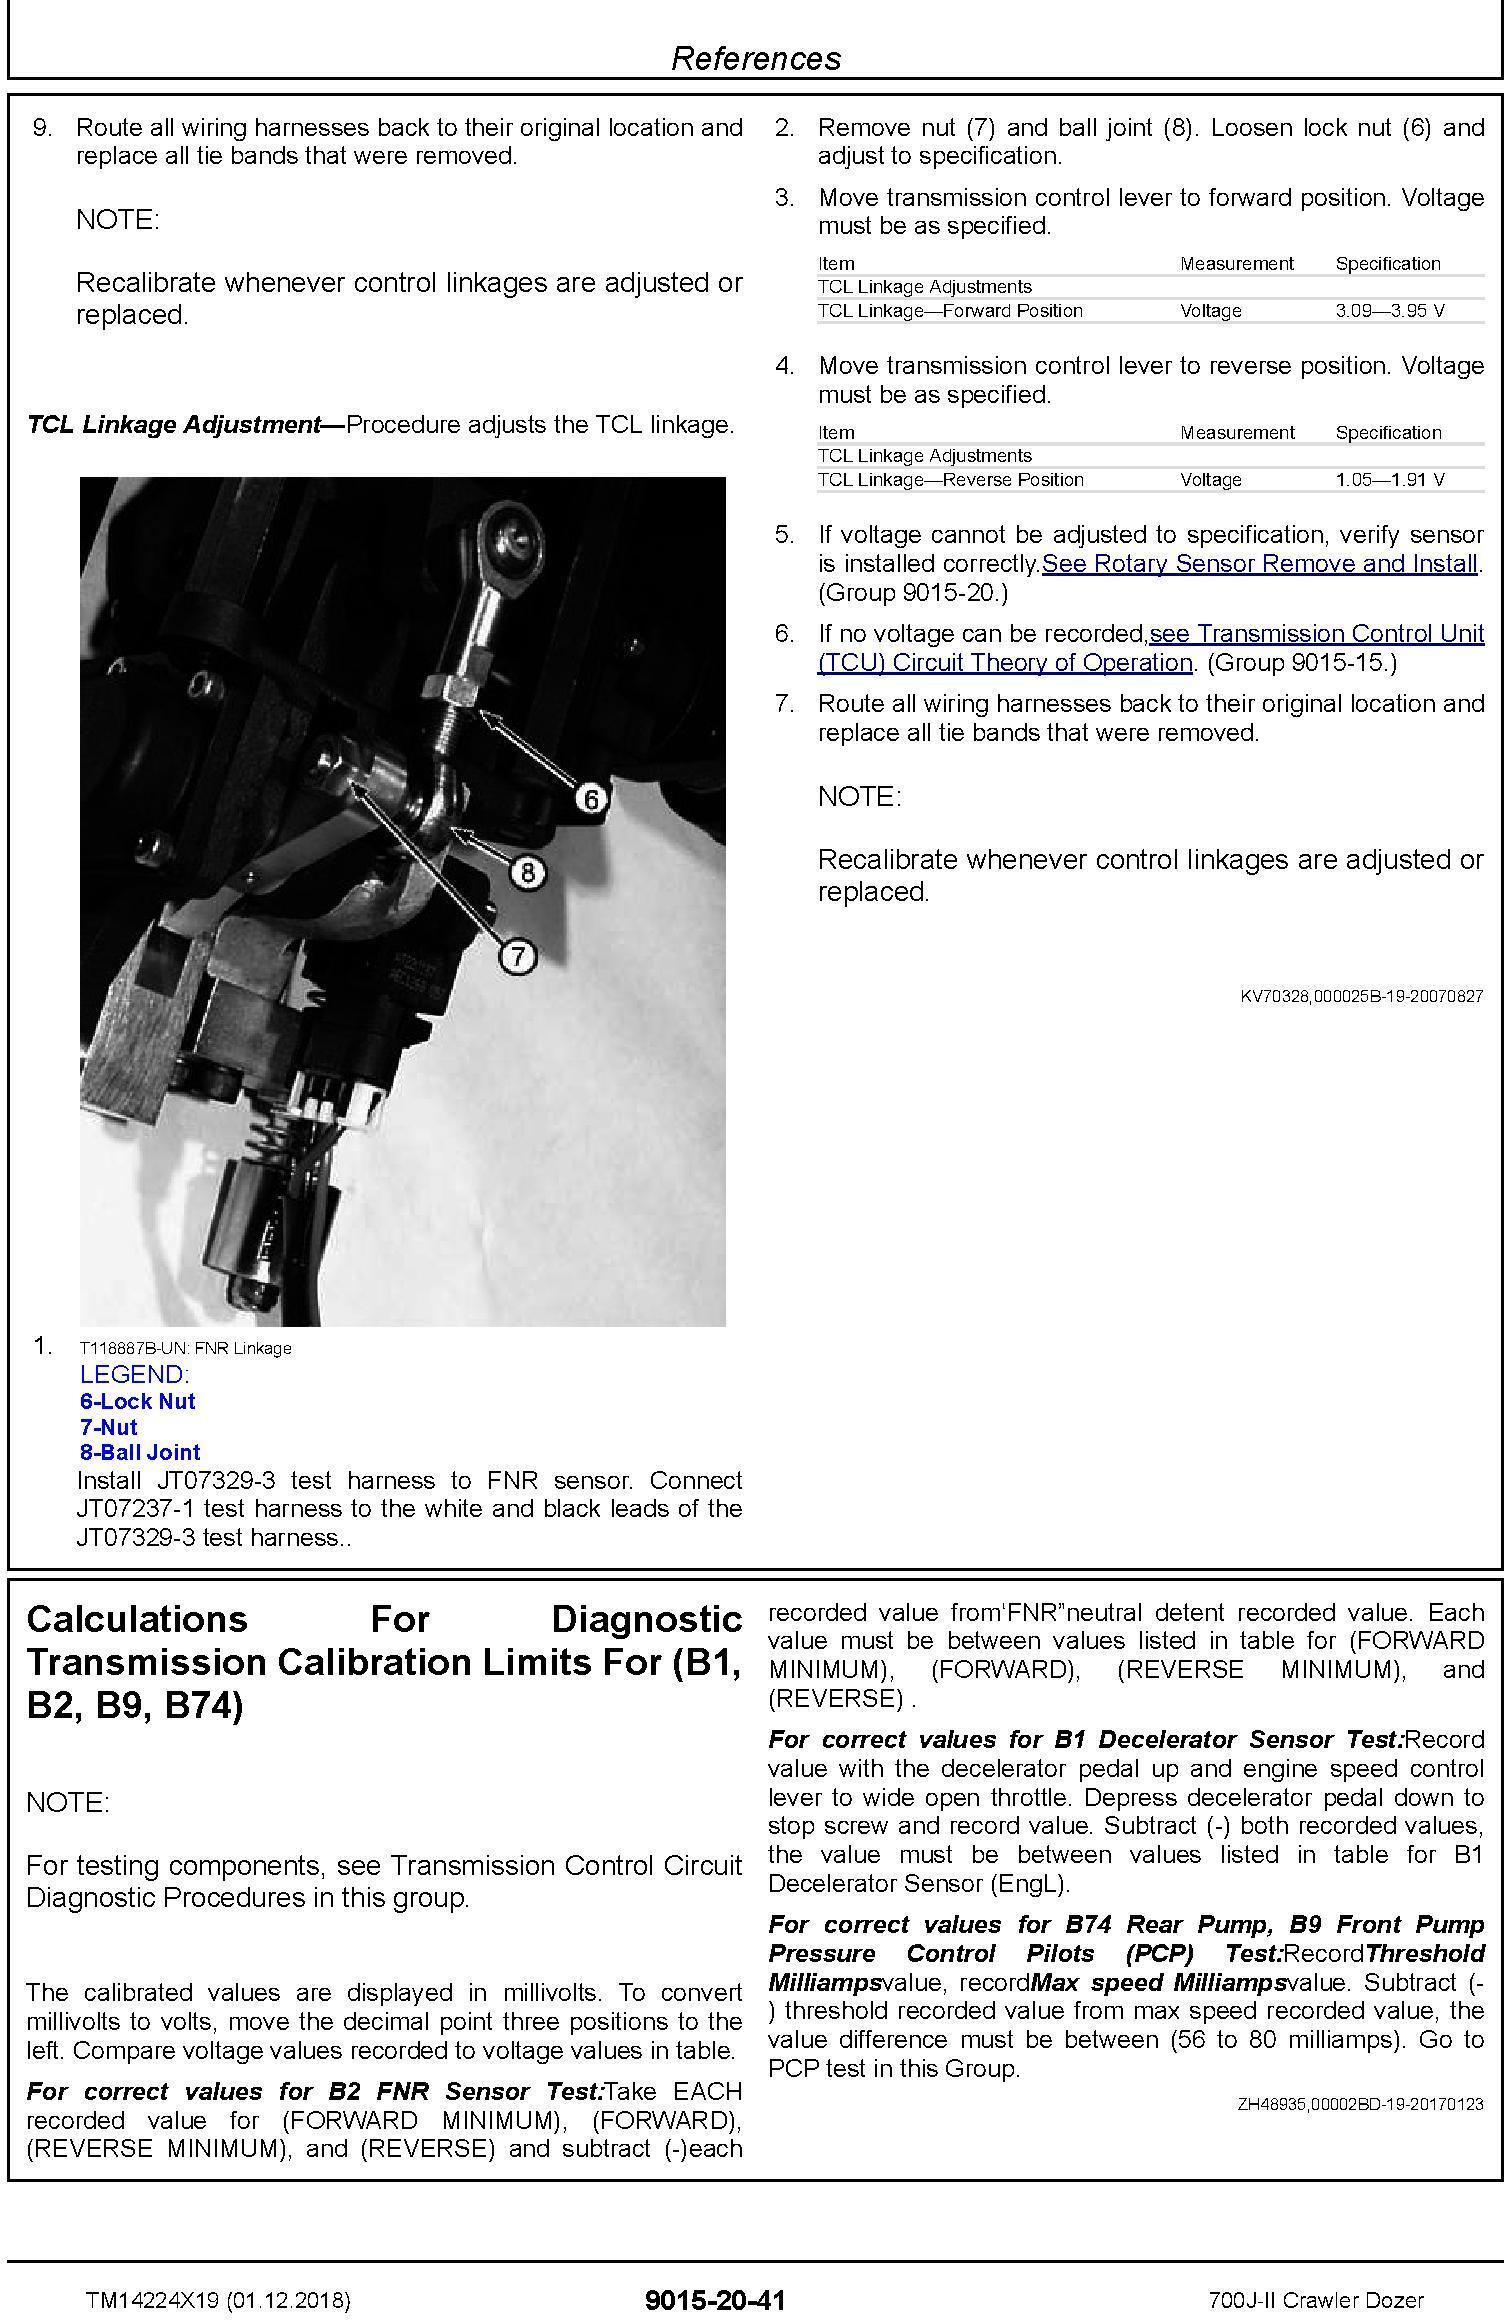 John Deere 700J-II (SN. from D306726) Crawler Dozer Operation & Test Technical Manual (TM14224X19) - 3